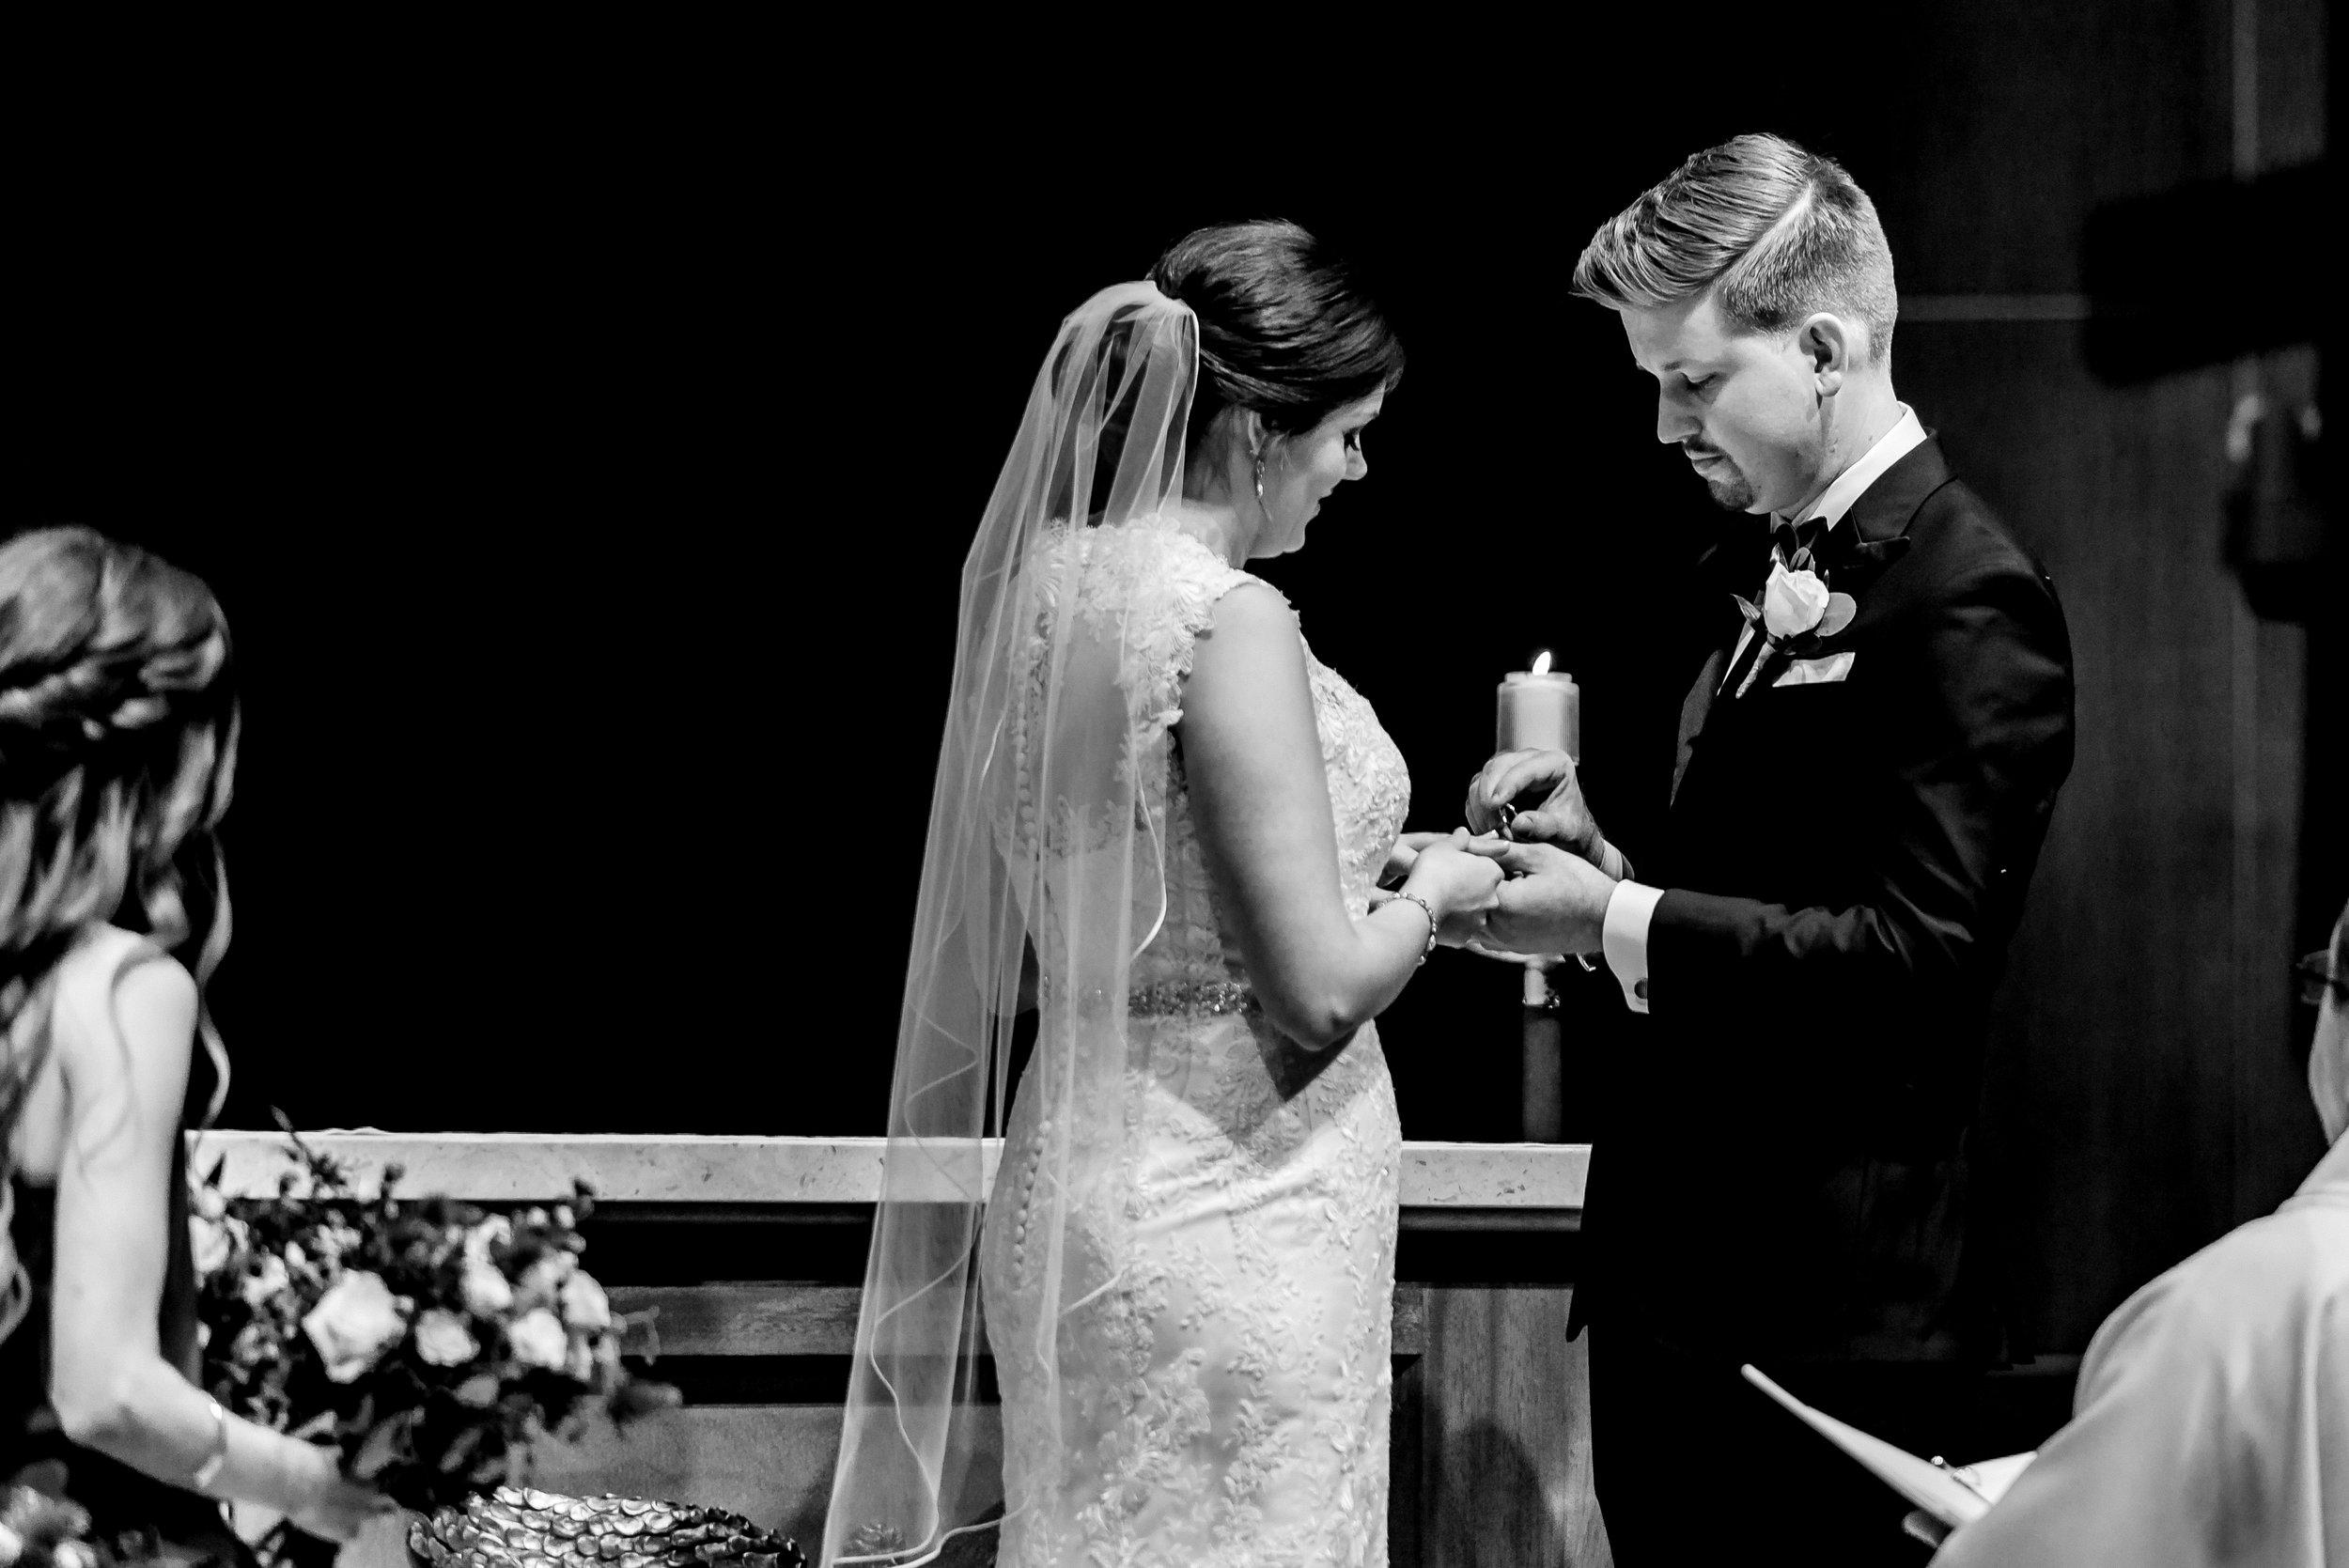 Groom Puts Ring on Bride's Finger - Wedding Ceremony at St. Olaf Catholic Church - Minneapolis Wedding Photojournalist